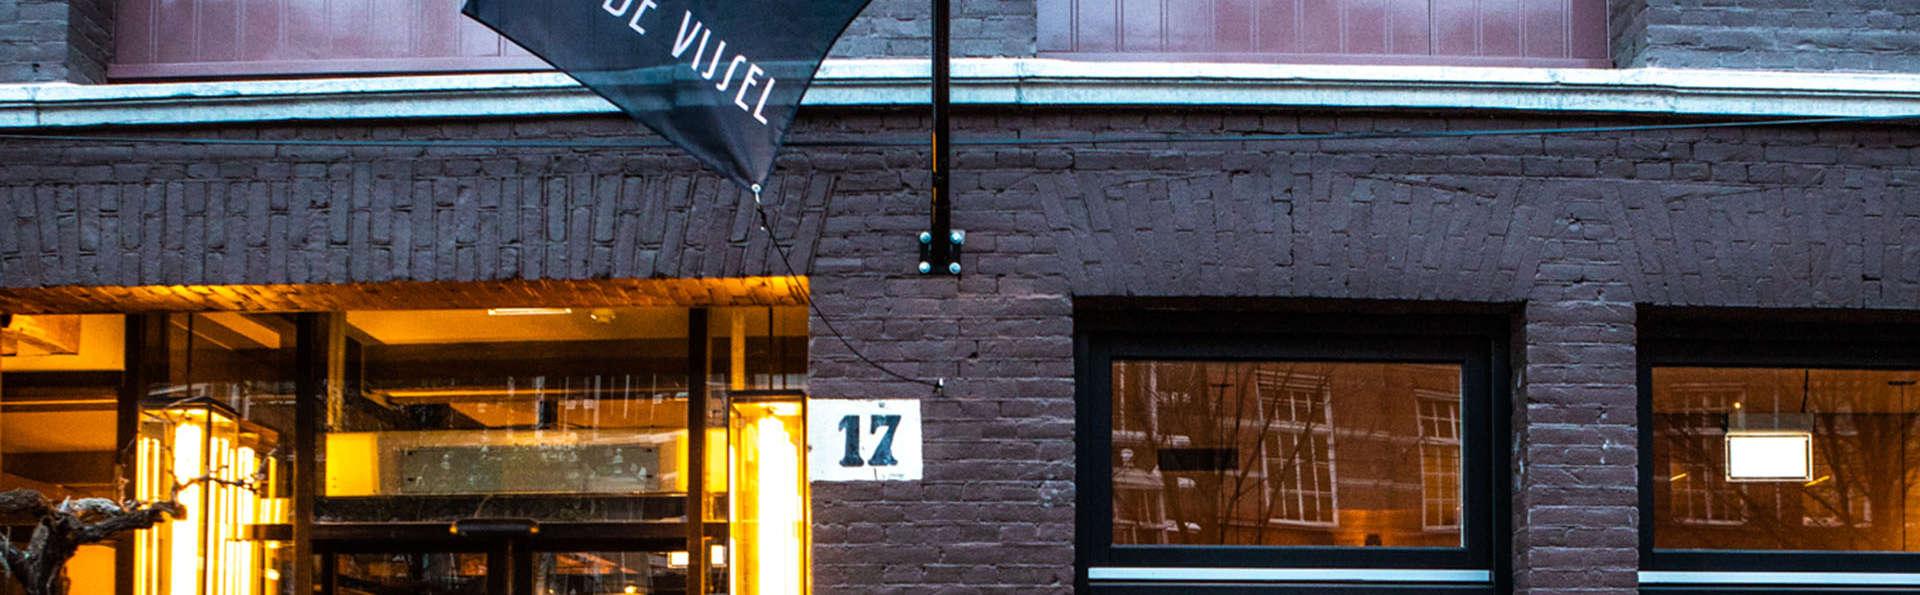 Hotel Van De Vijsel - EDIT_LucasKemper_Vondel_Vijsel_Outside_LR-10.jpg